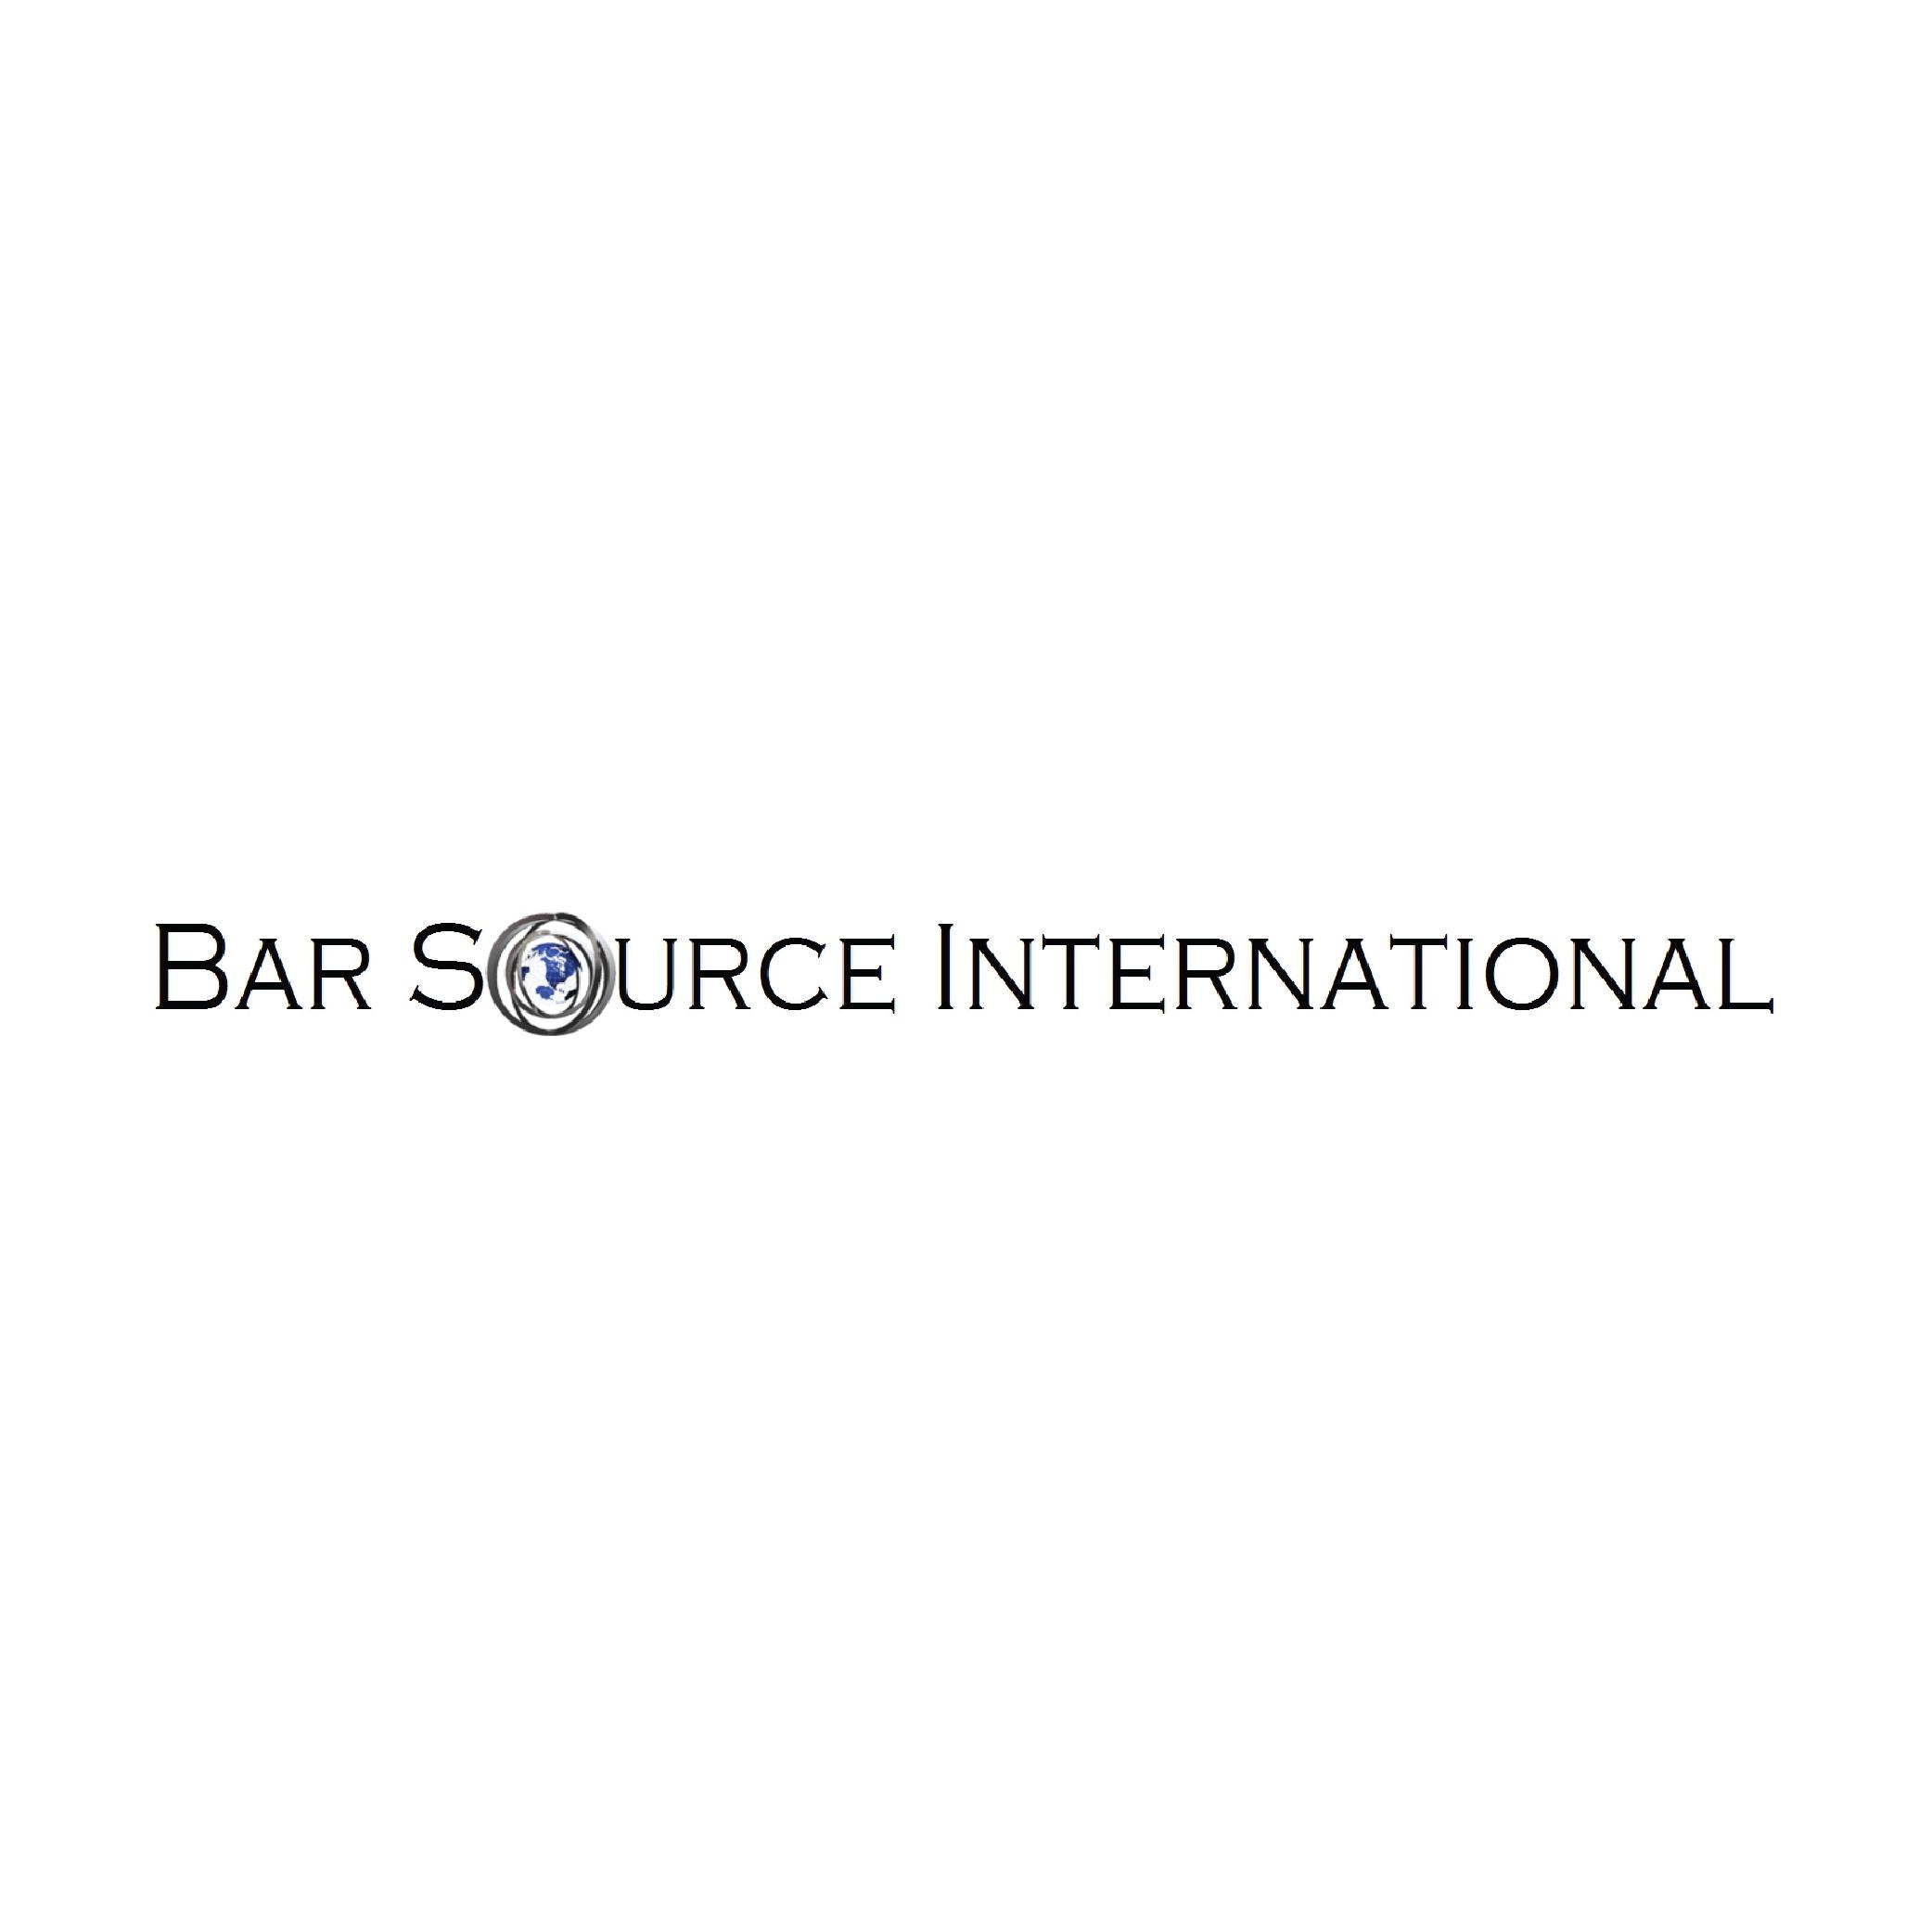 Bar Source International